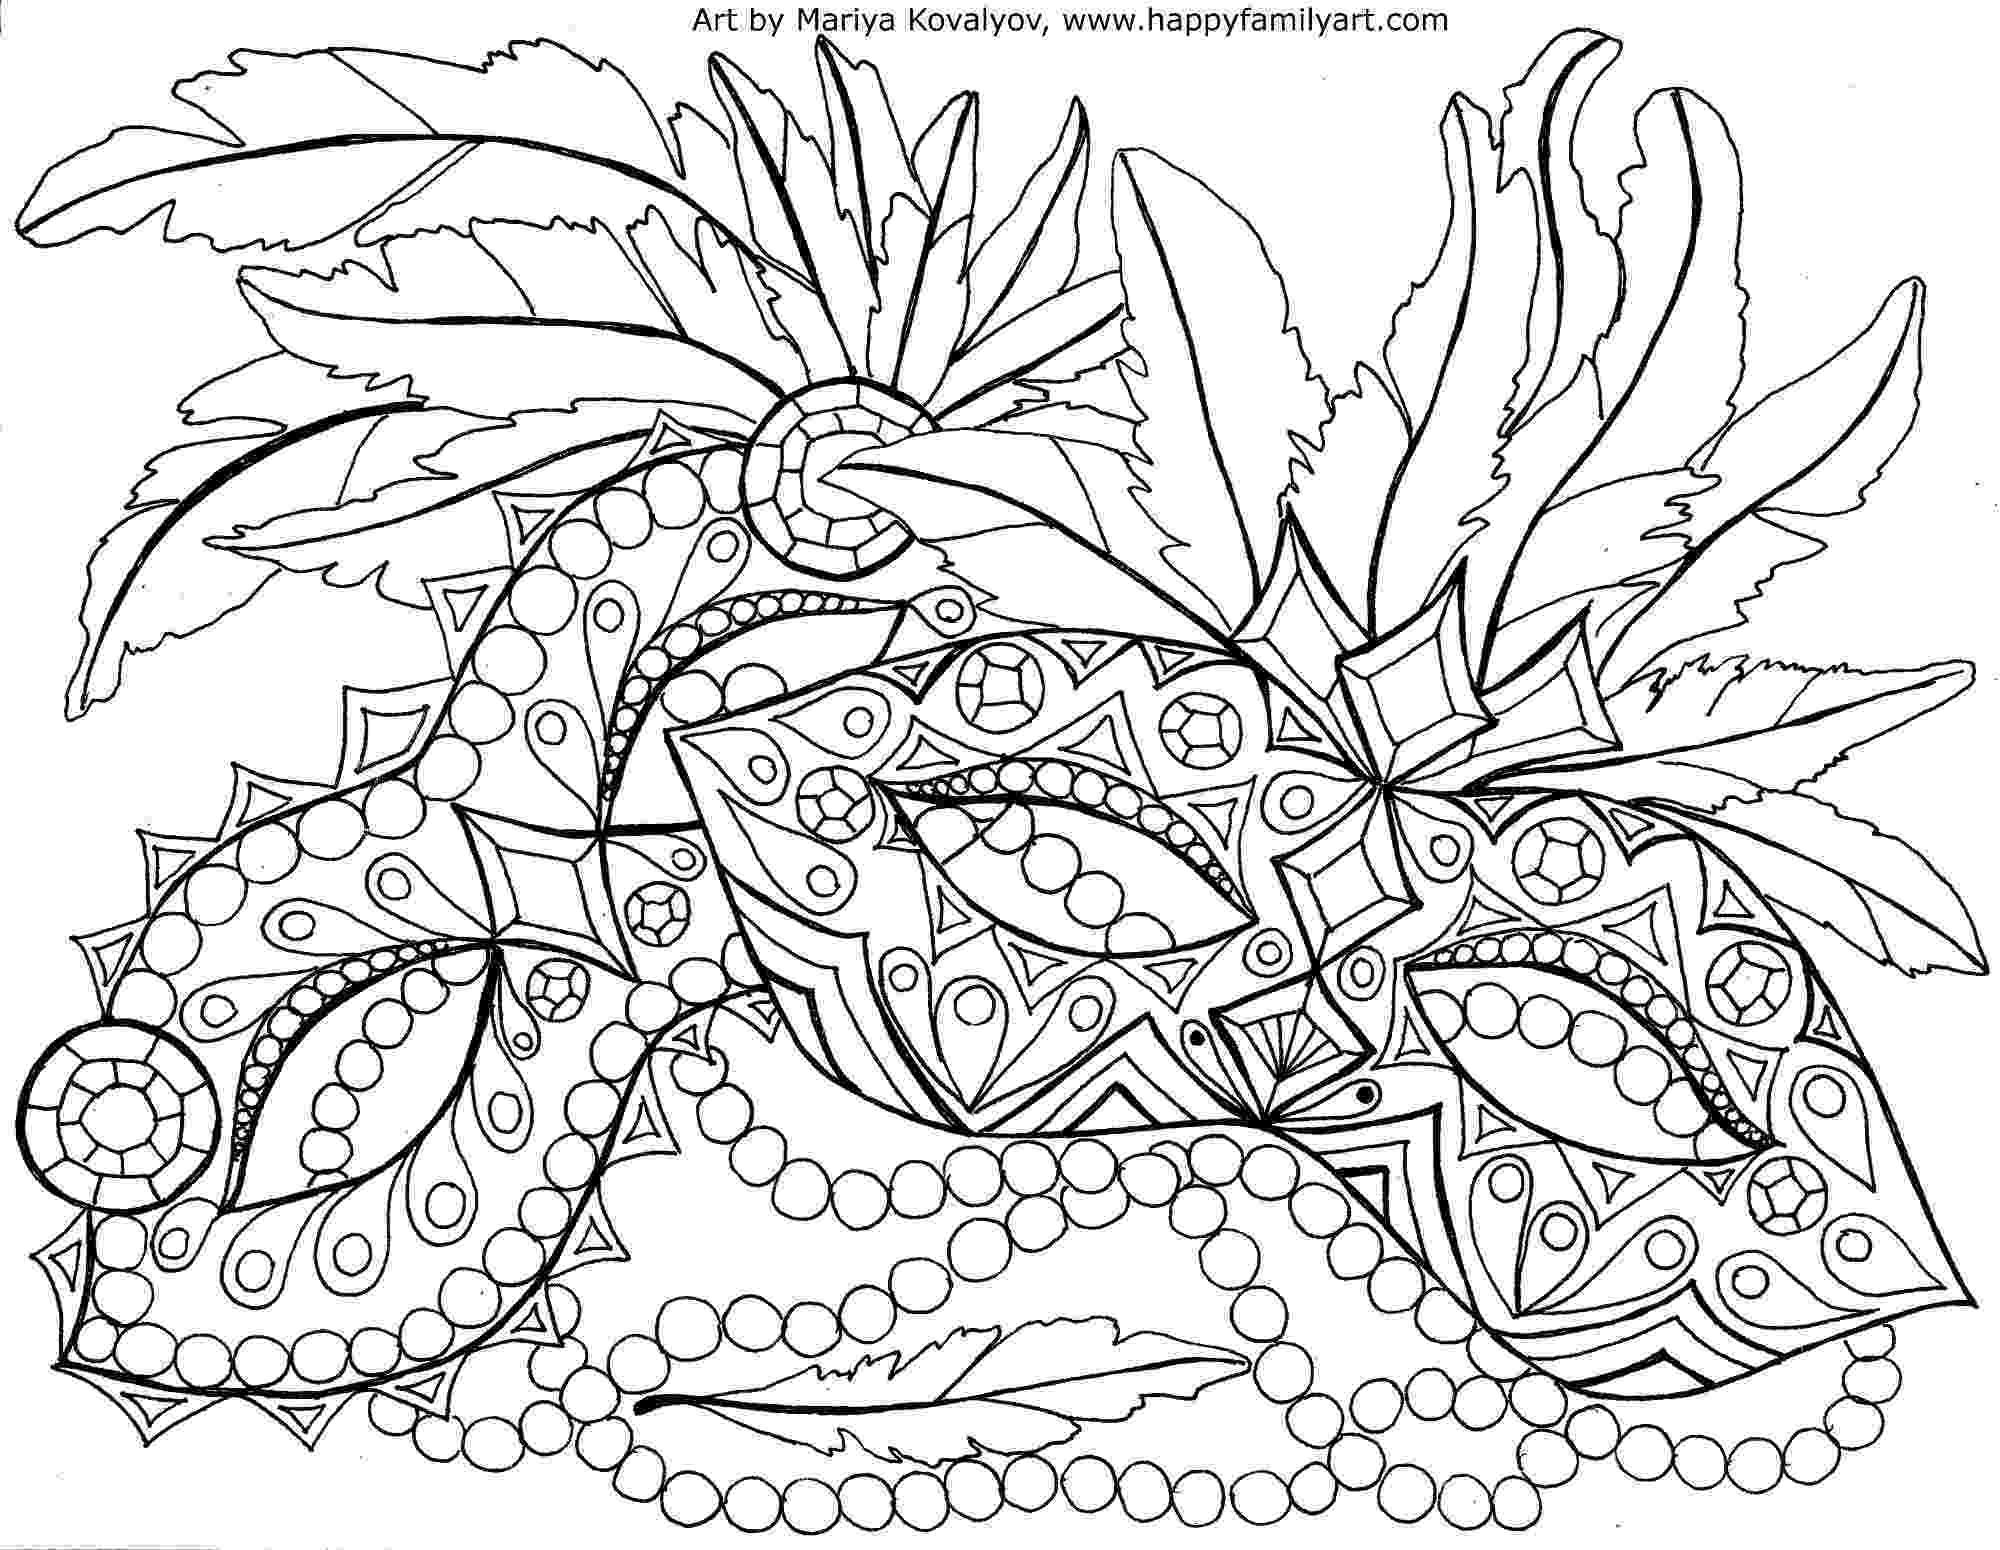 mardi gras mask coloring sheet printable mardi gras coloring pages for kids cool2bkids gras sheet mardi coloring mask